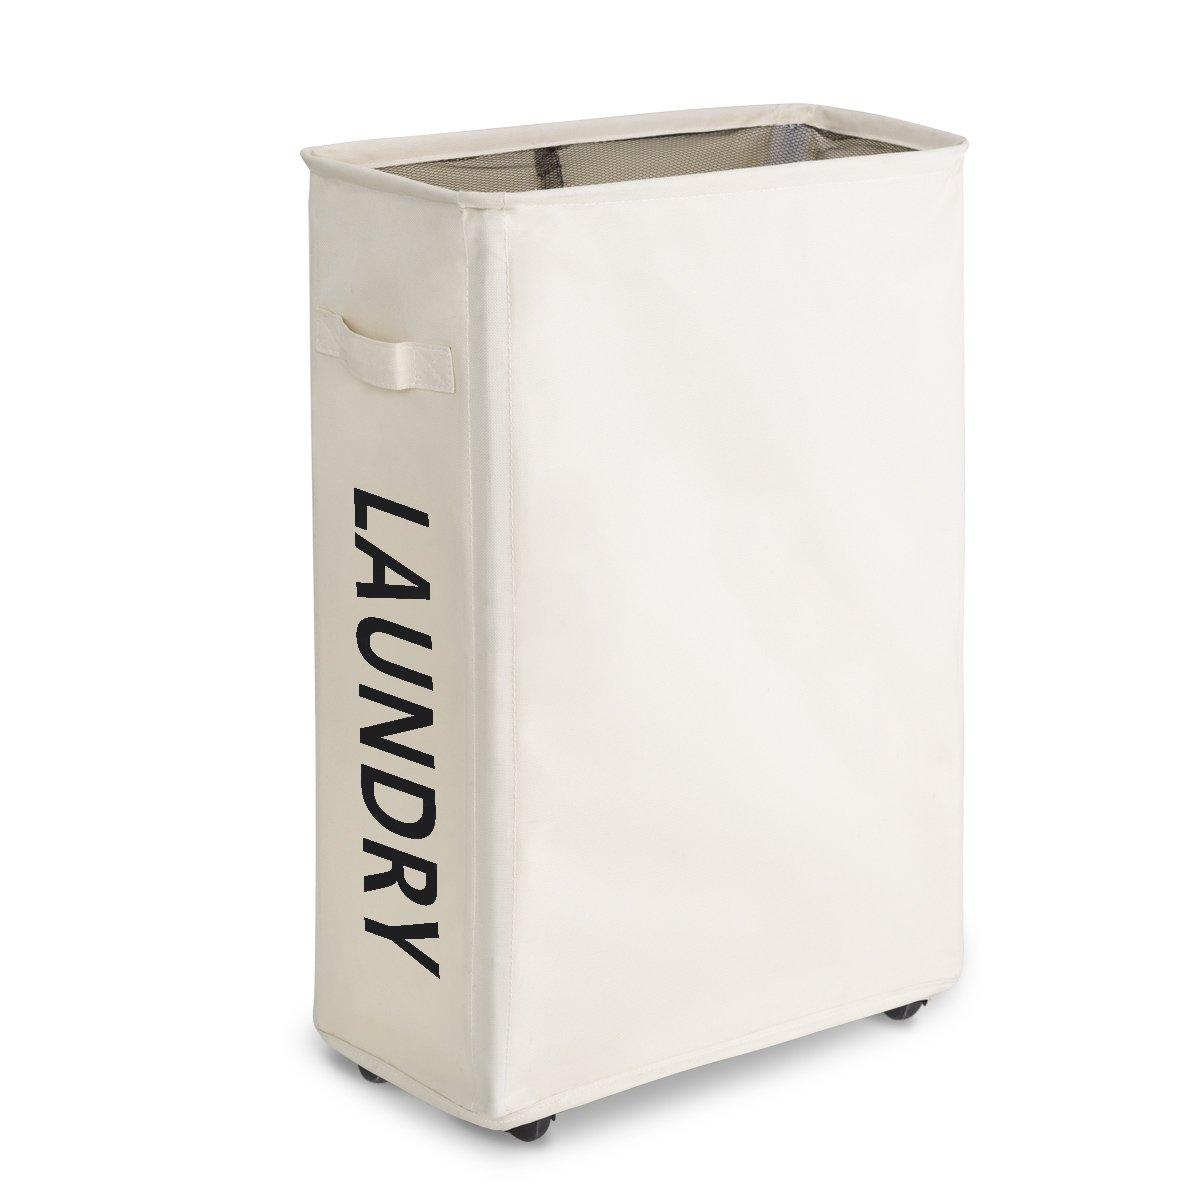 zero jet lag rolling slim laundry hamper with stand. Black Bedroom Furniture Sets. Home Design Ideas